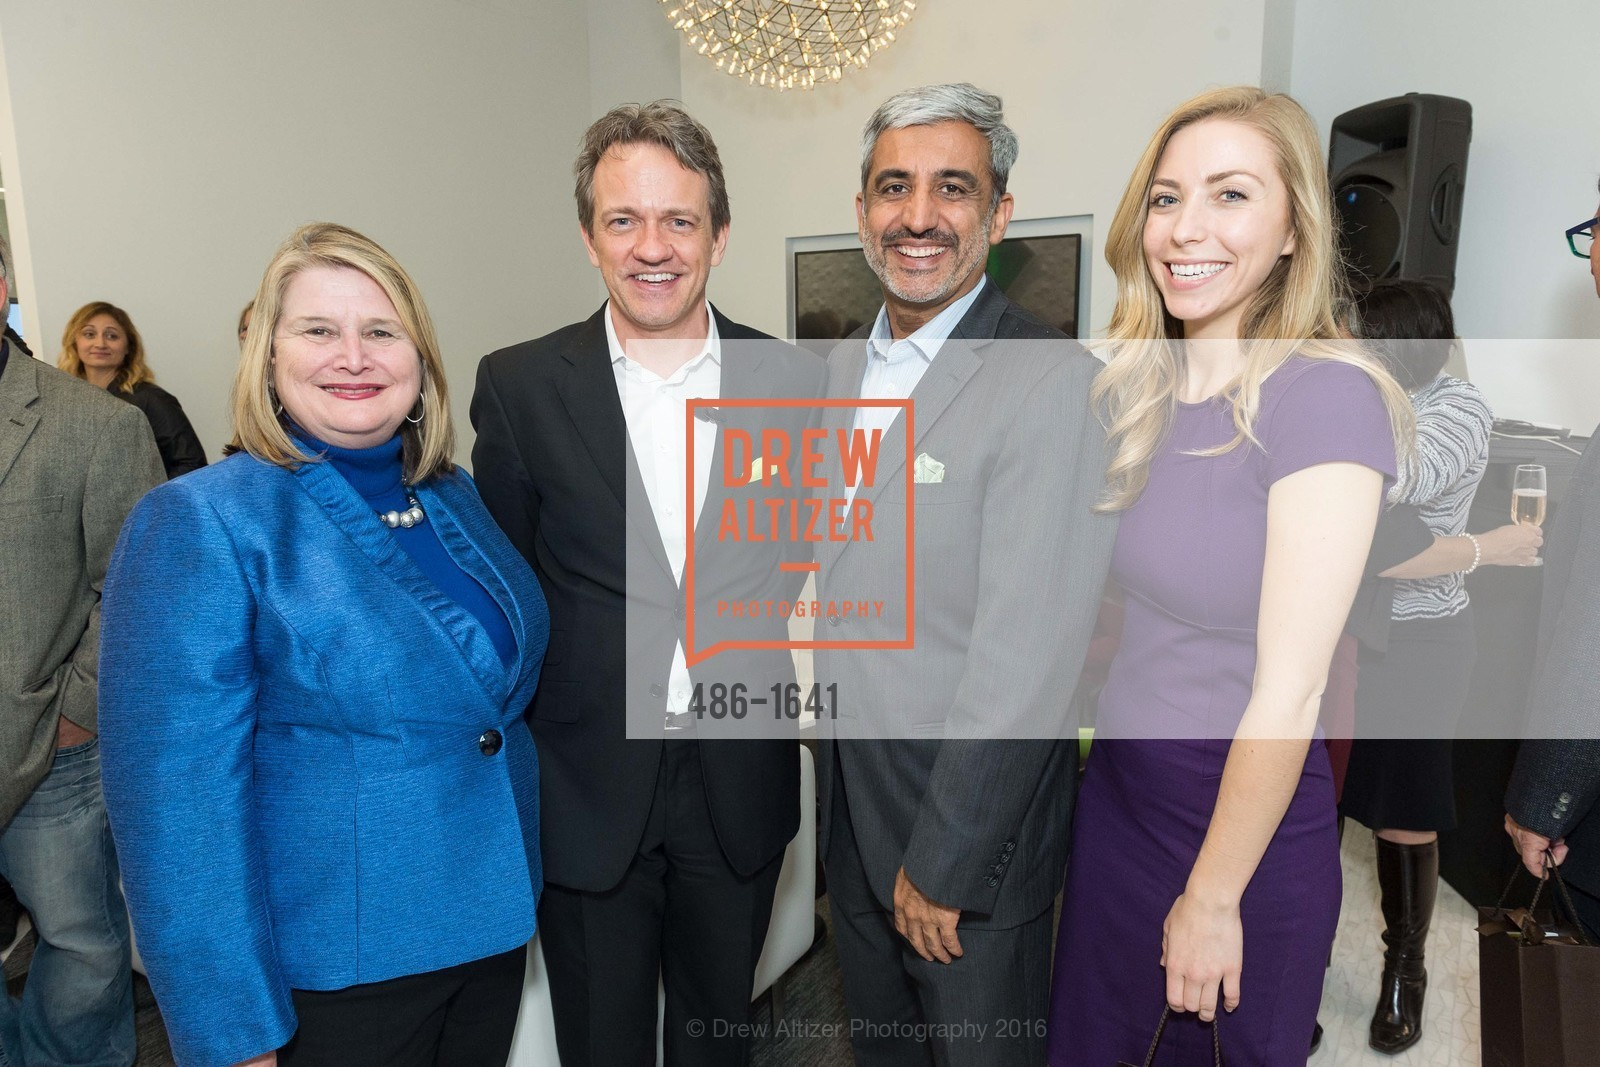 Rose Hererra, Eric Lindberg, Mohammed Chaudhry, Jennifer Riland, Photo #486-1641